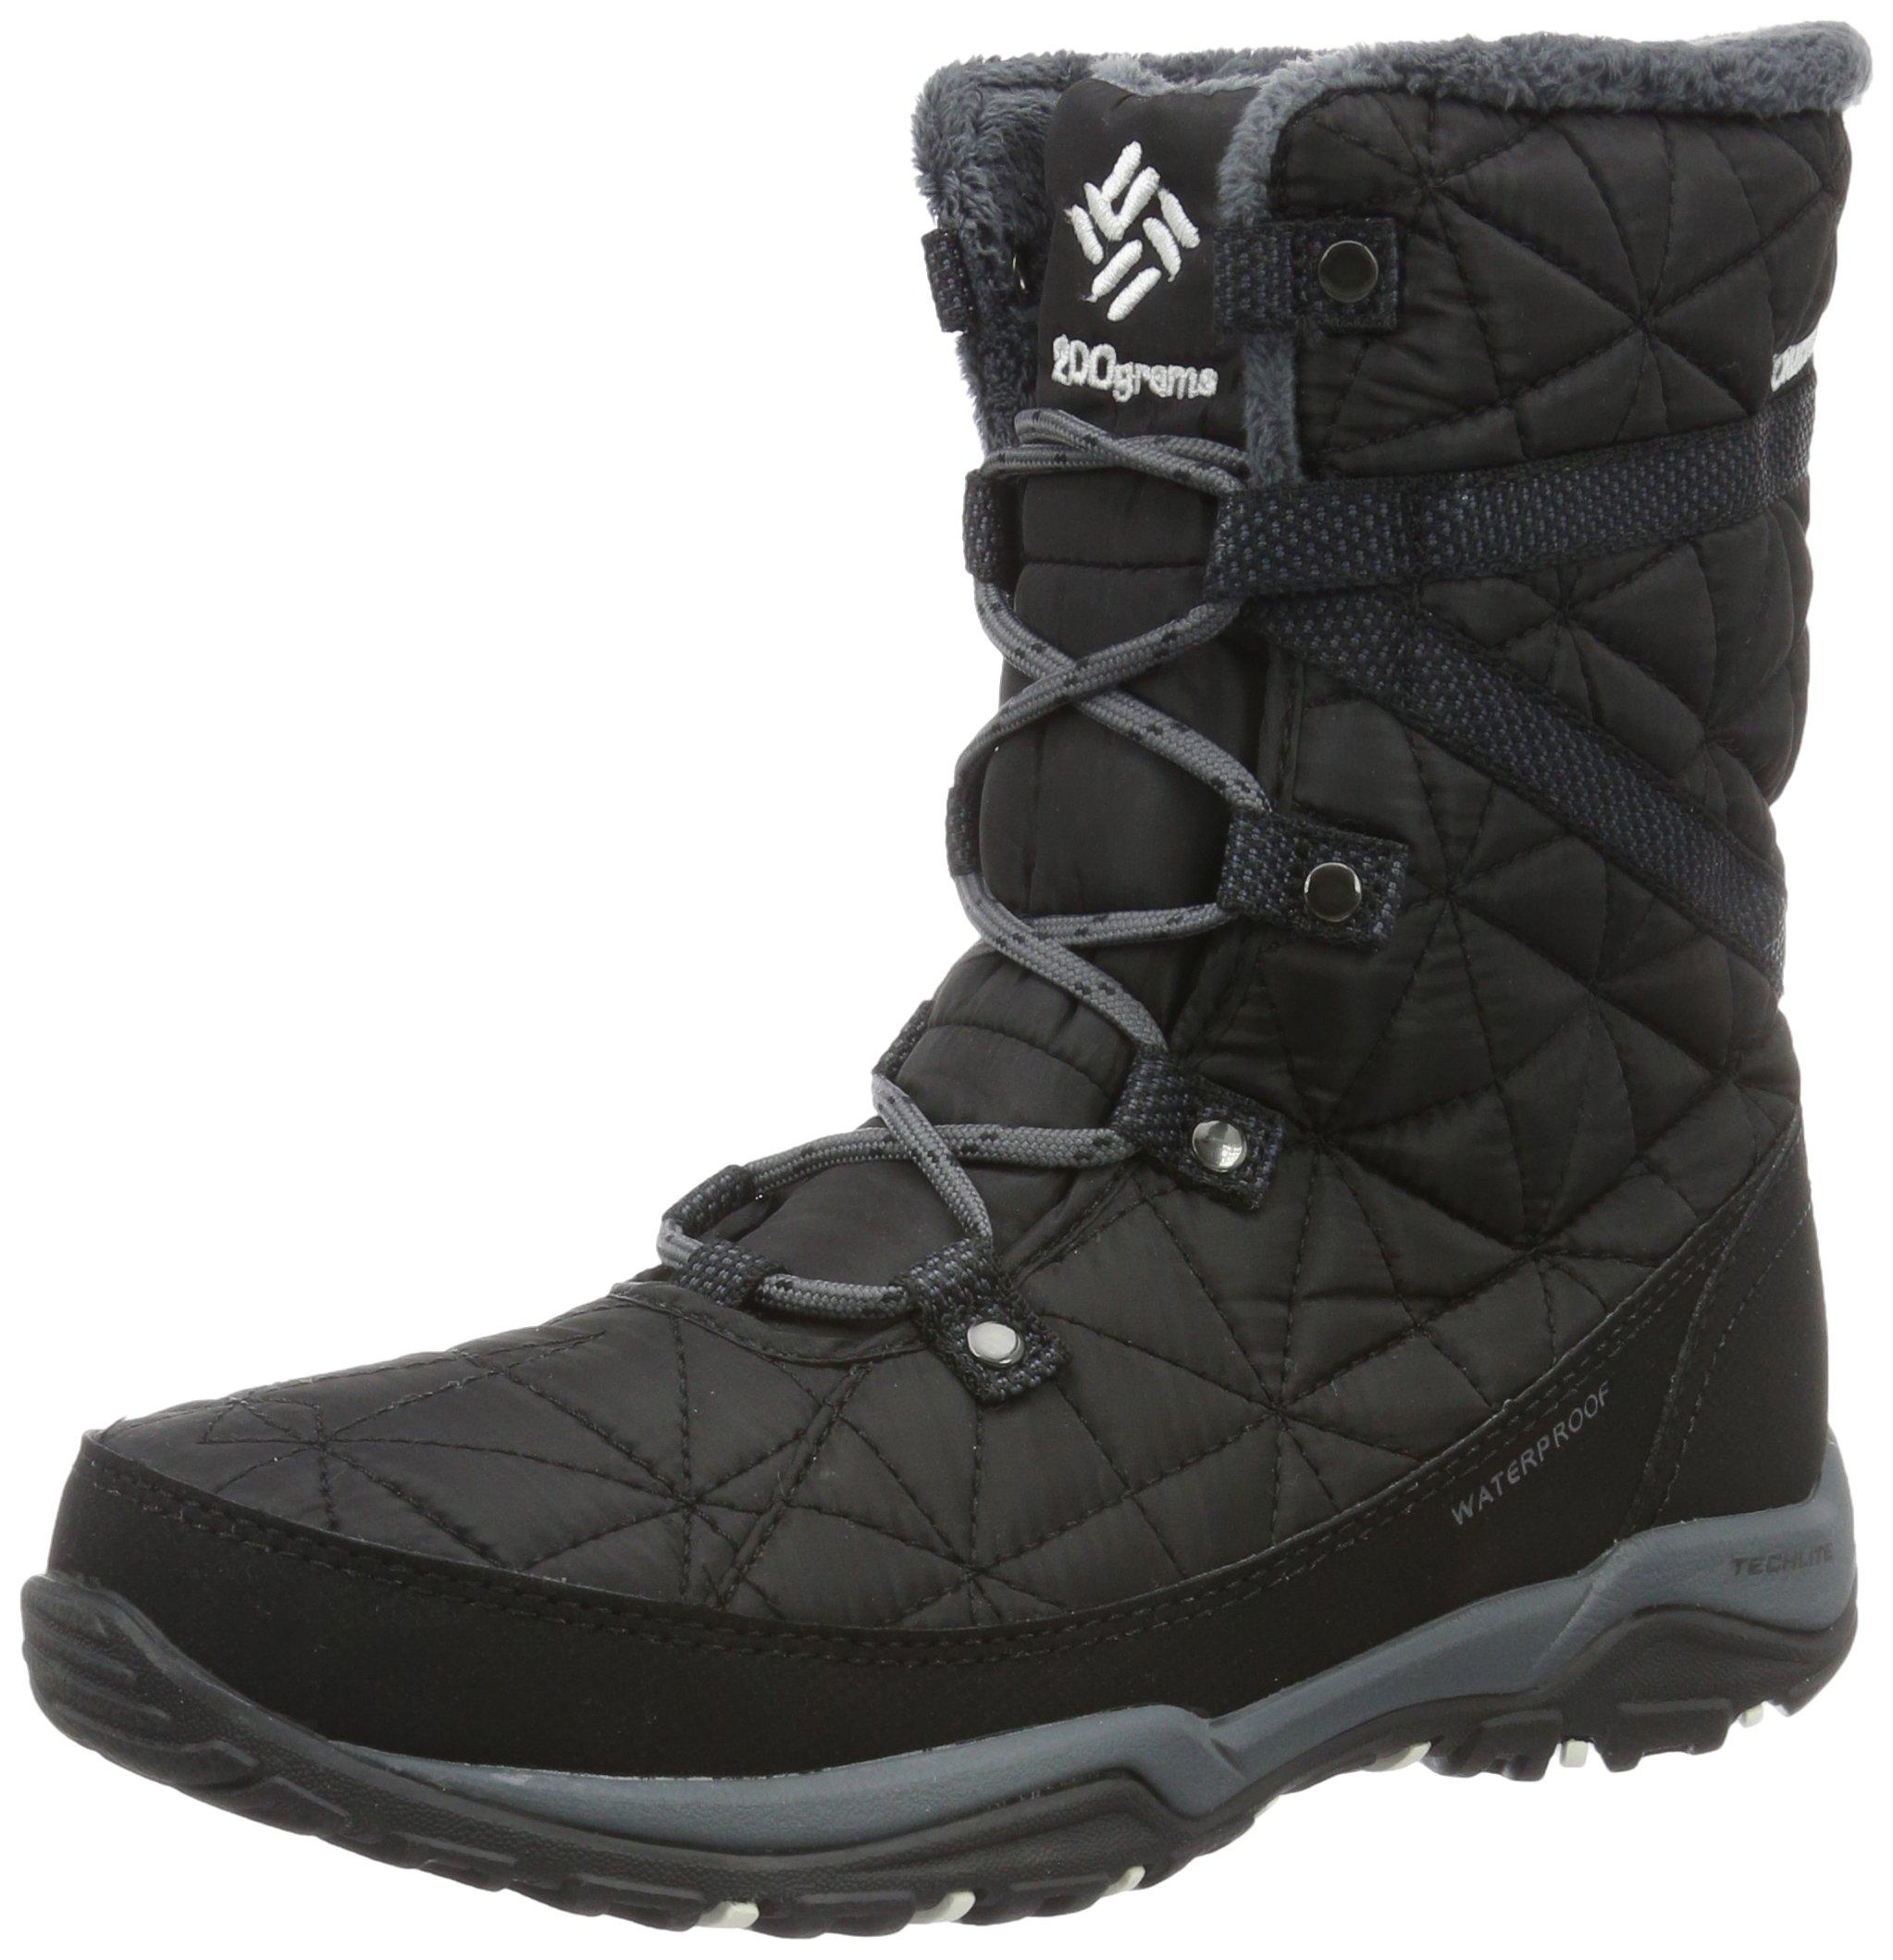 Columbia Women's Loveland Mid Omni-Heat Snow Boot, Black/Sea Salt, 9 B US